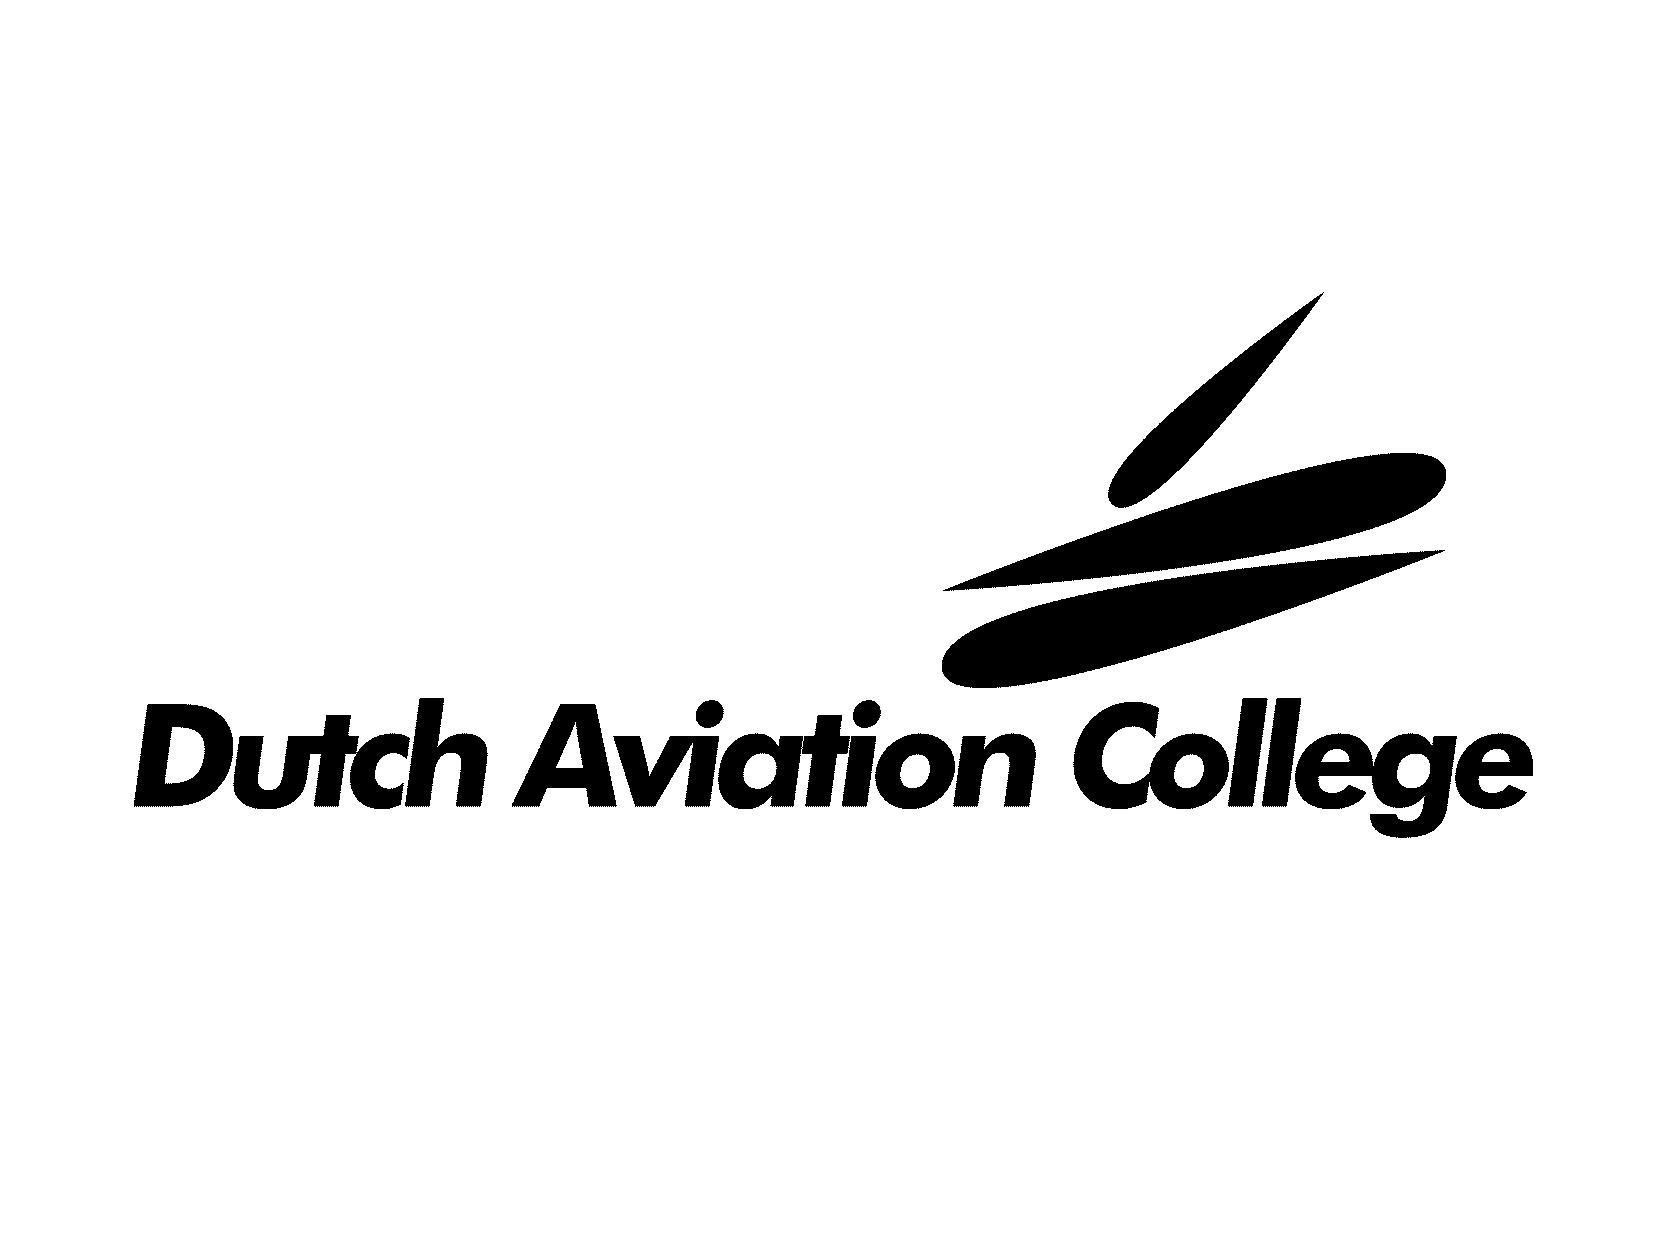 Dutch Aviation College